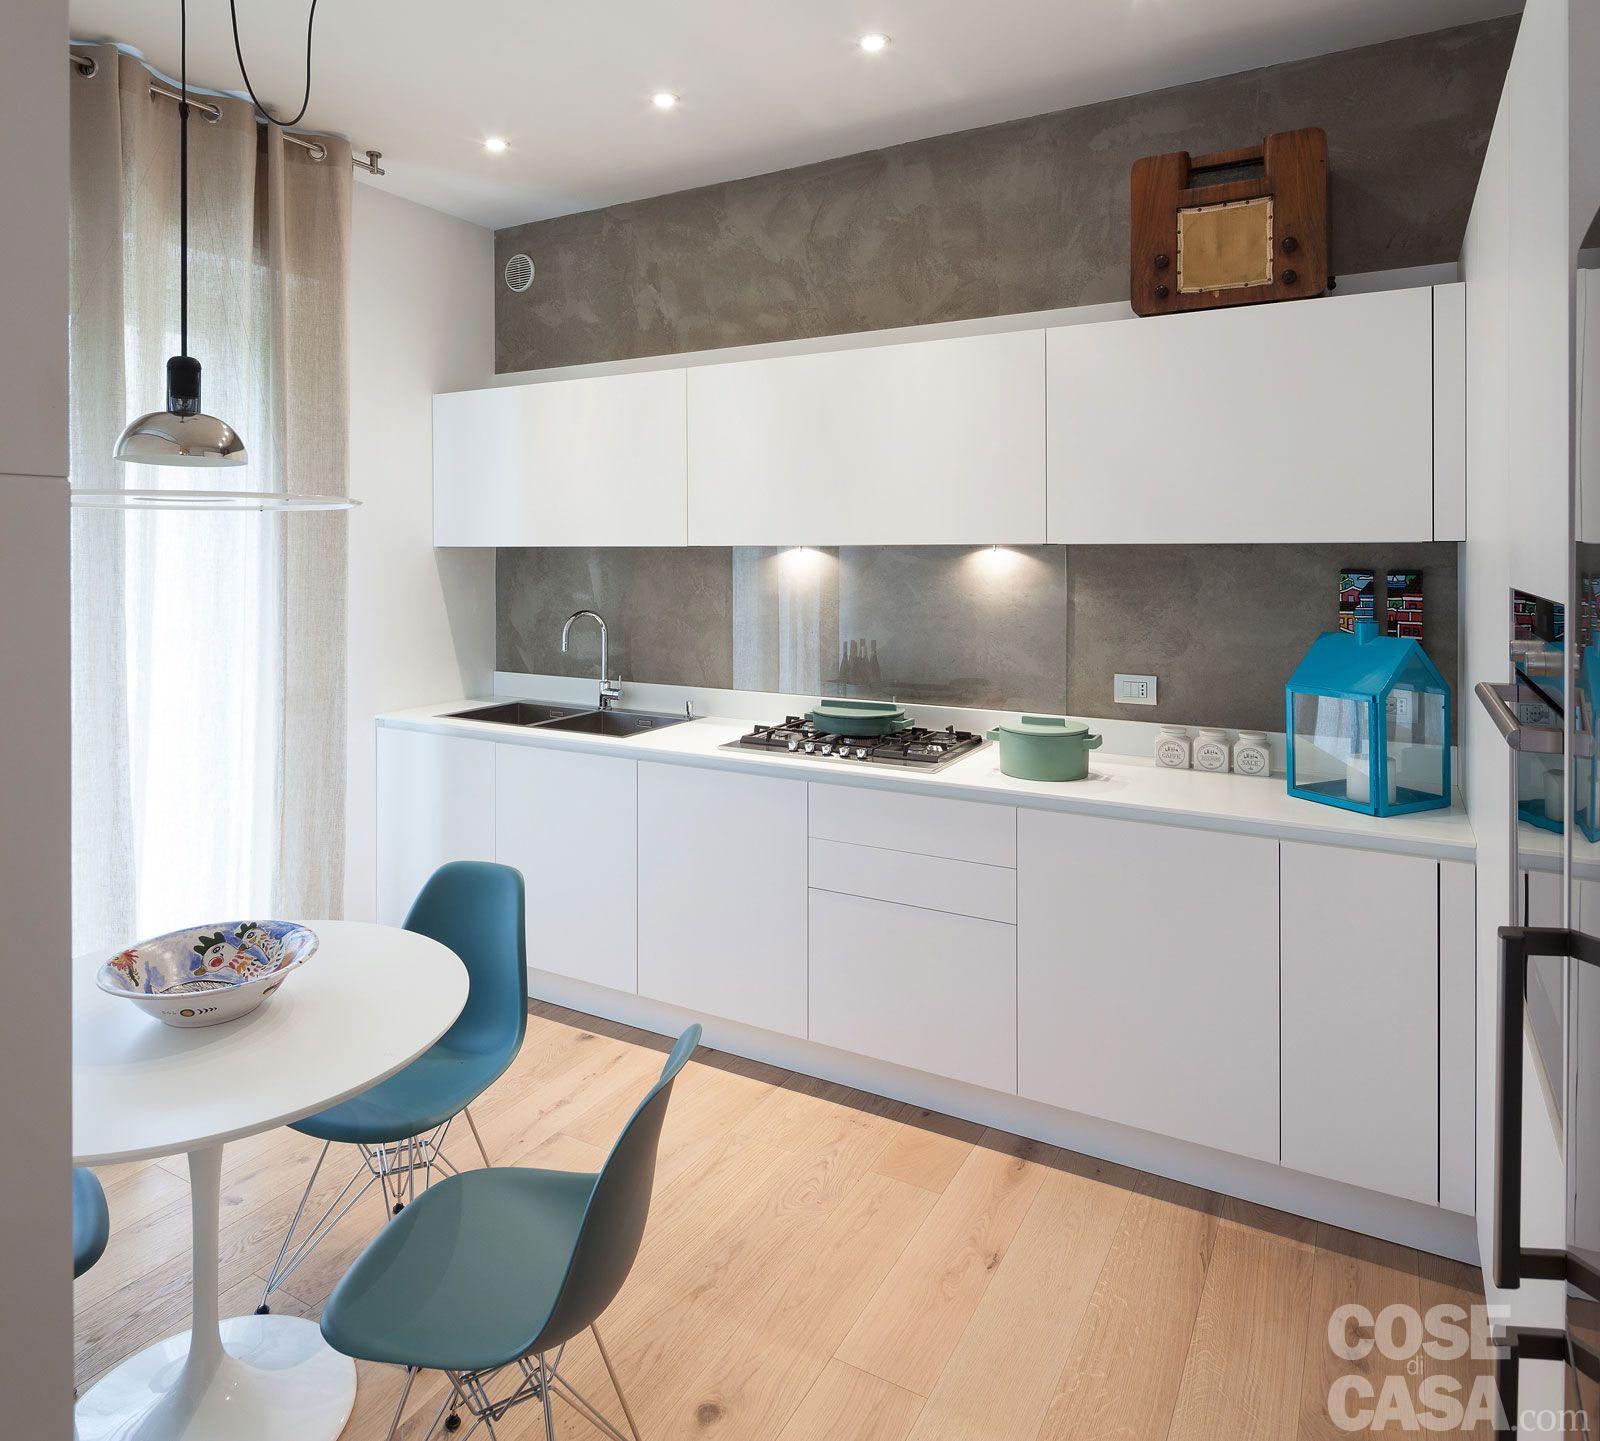 Cucina bianca boffi anta laccata opaca e parete grigio - Cucine boffi milano ...